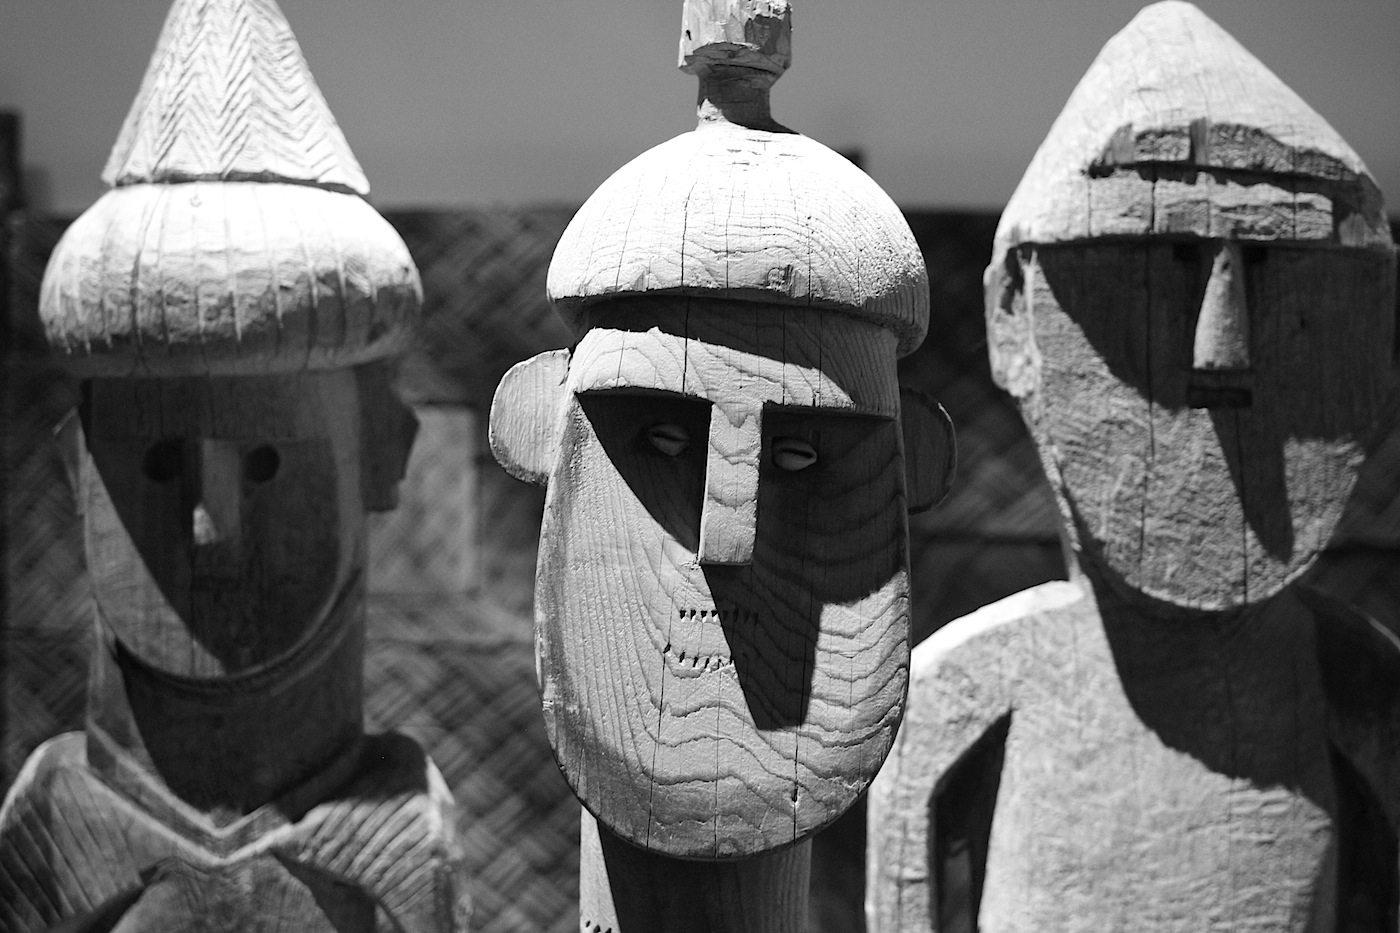 Moesgaard Museum. Temporäre Schauen wie